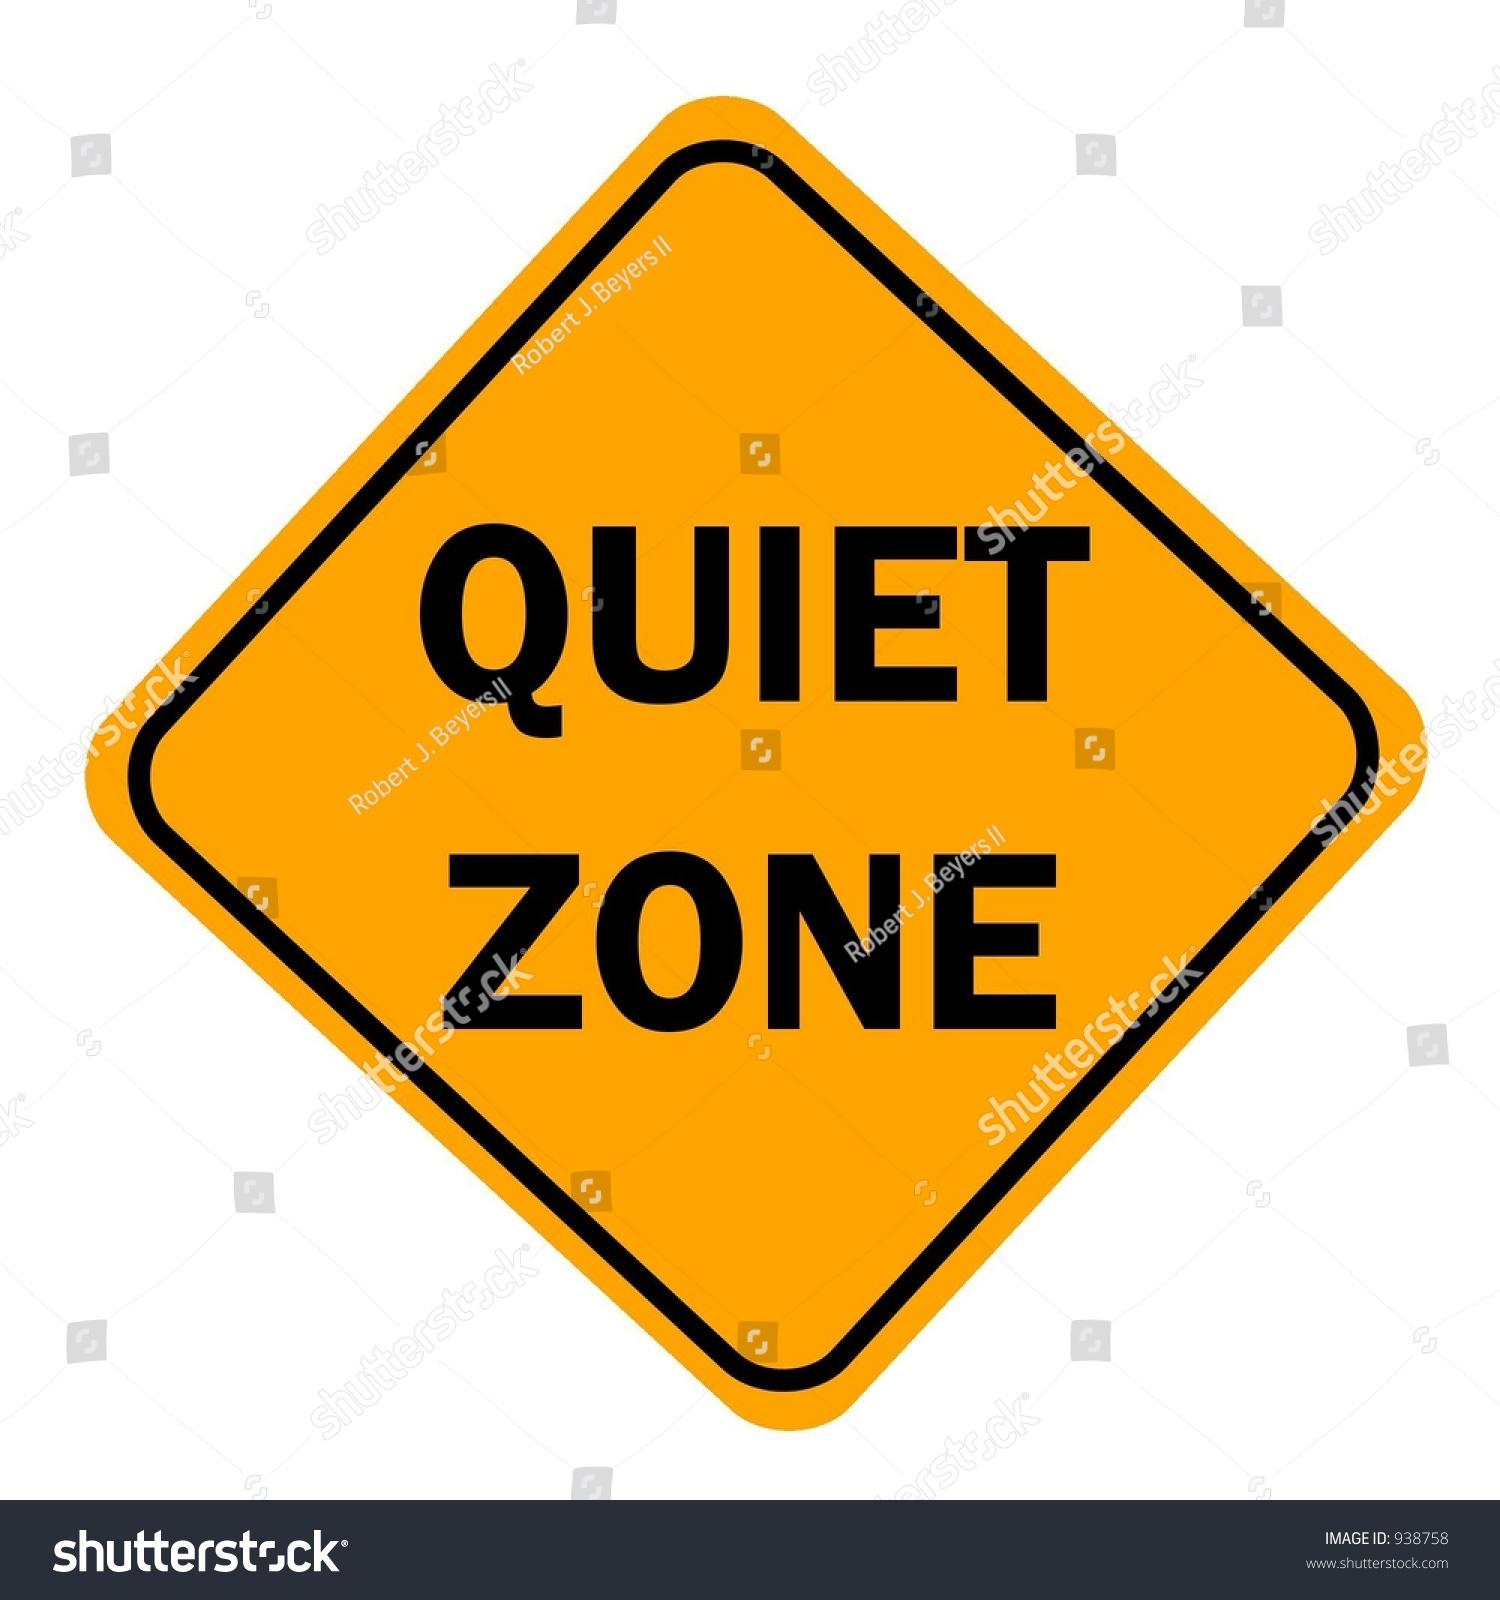 free clipart quiet zone - photo #3